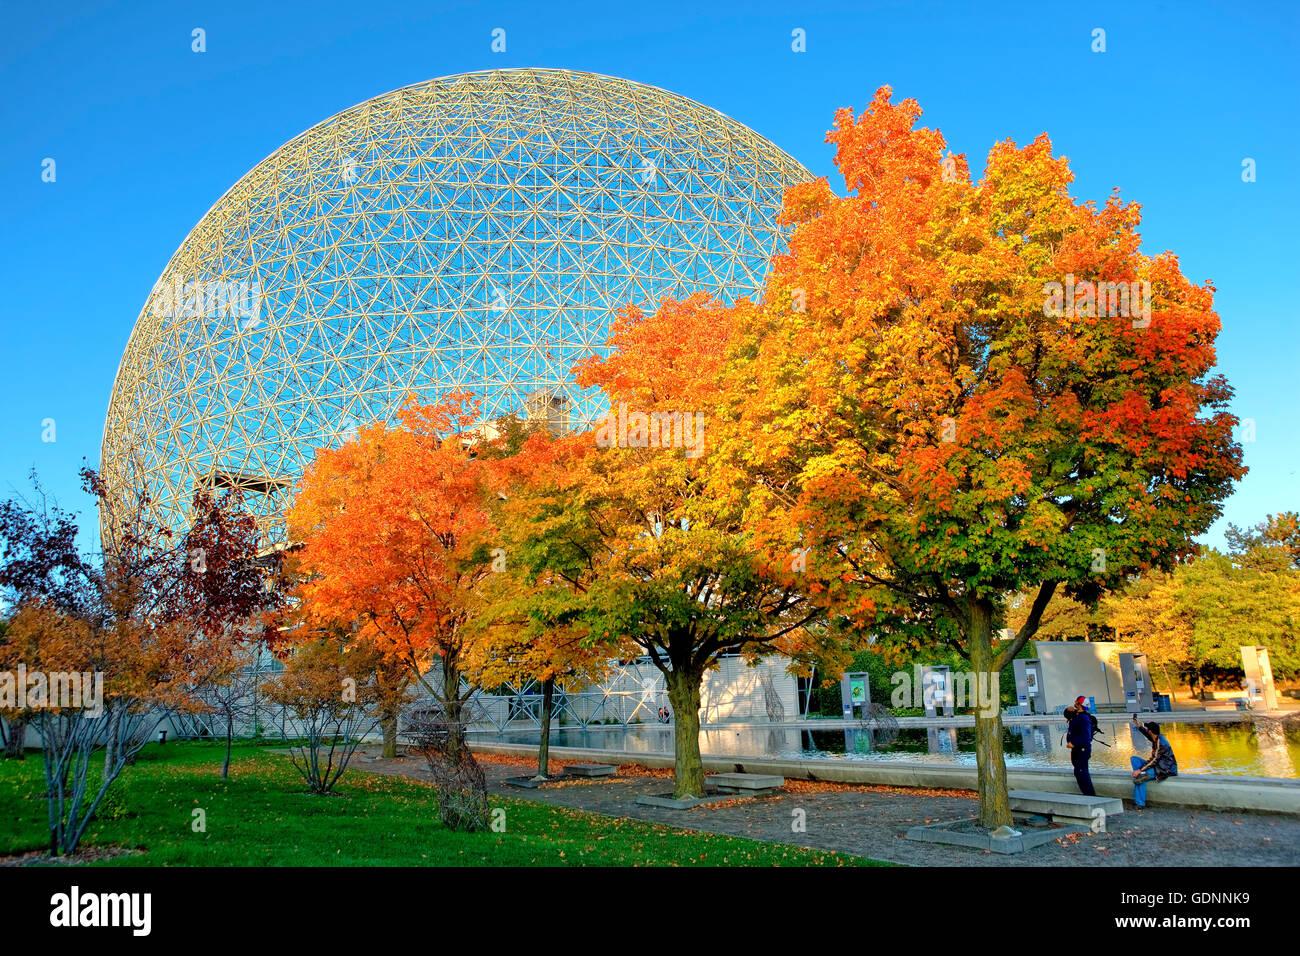 Die Biosphäre-Struktur auf der Insel Saint Helene in Jean Drapeau Park in Montreal Stockbild